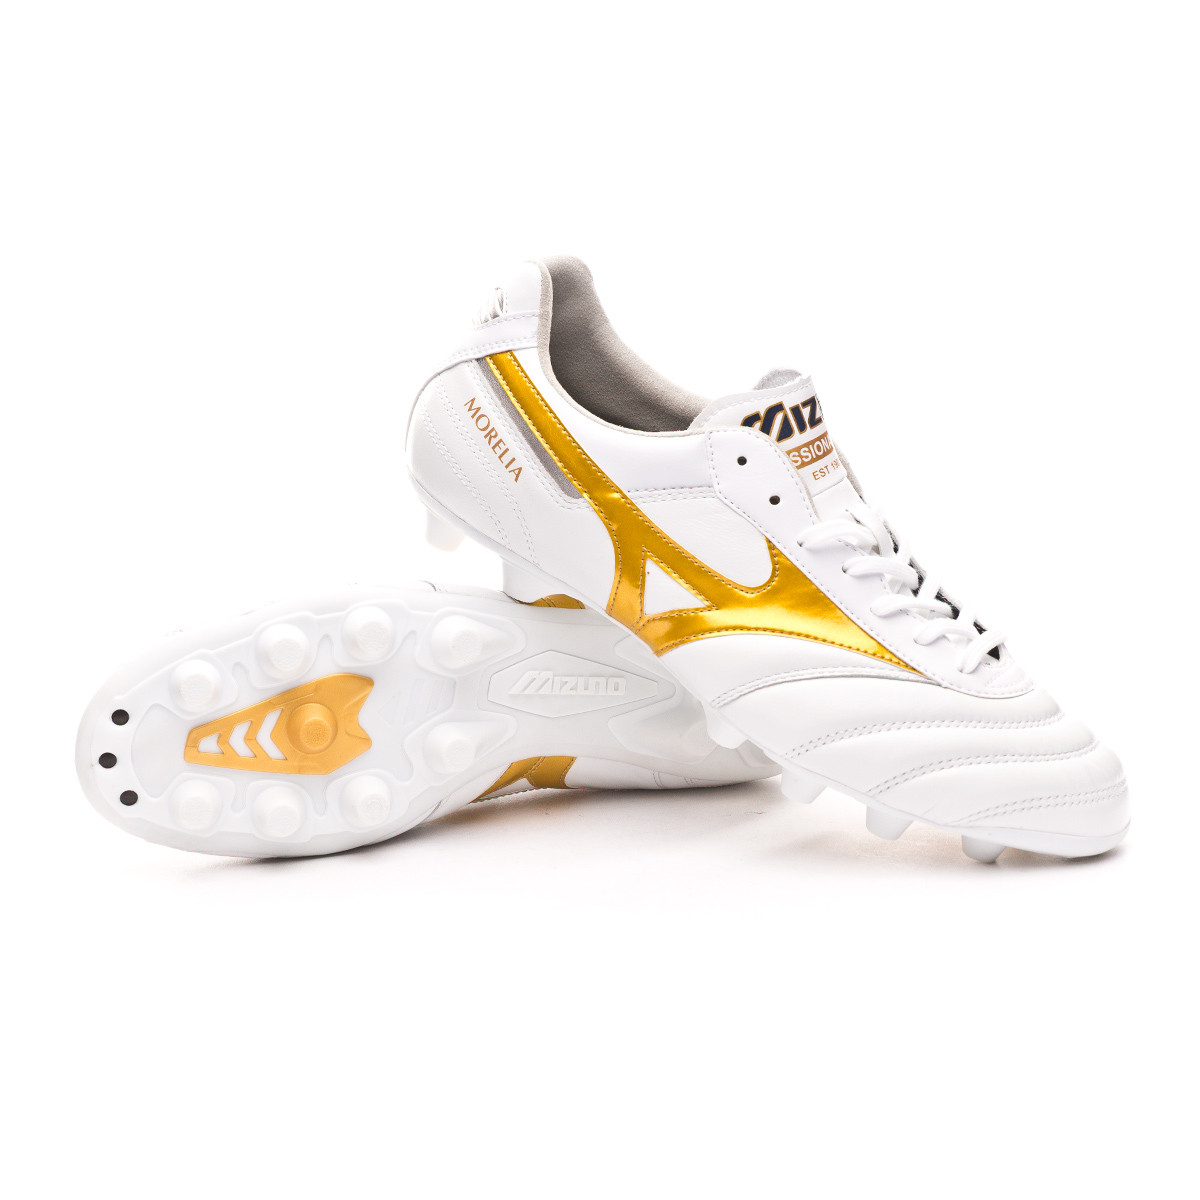 mens mizuno running shoes size 9.5 in europe zaragoza georgia